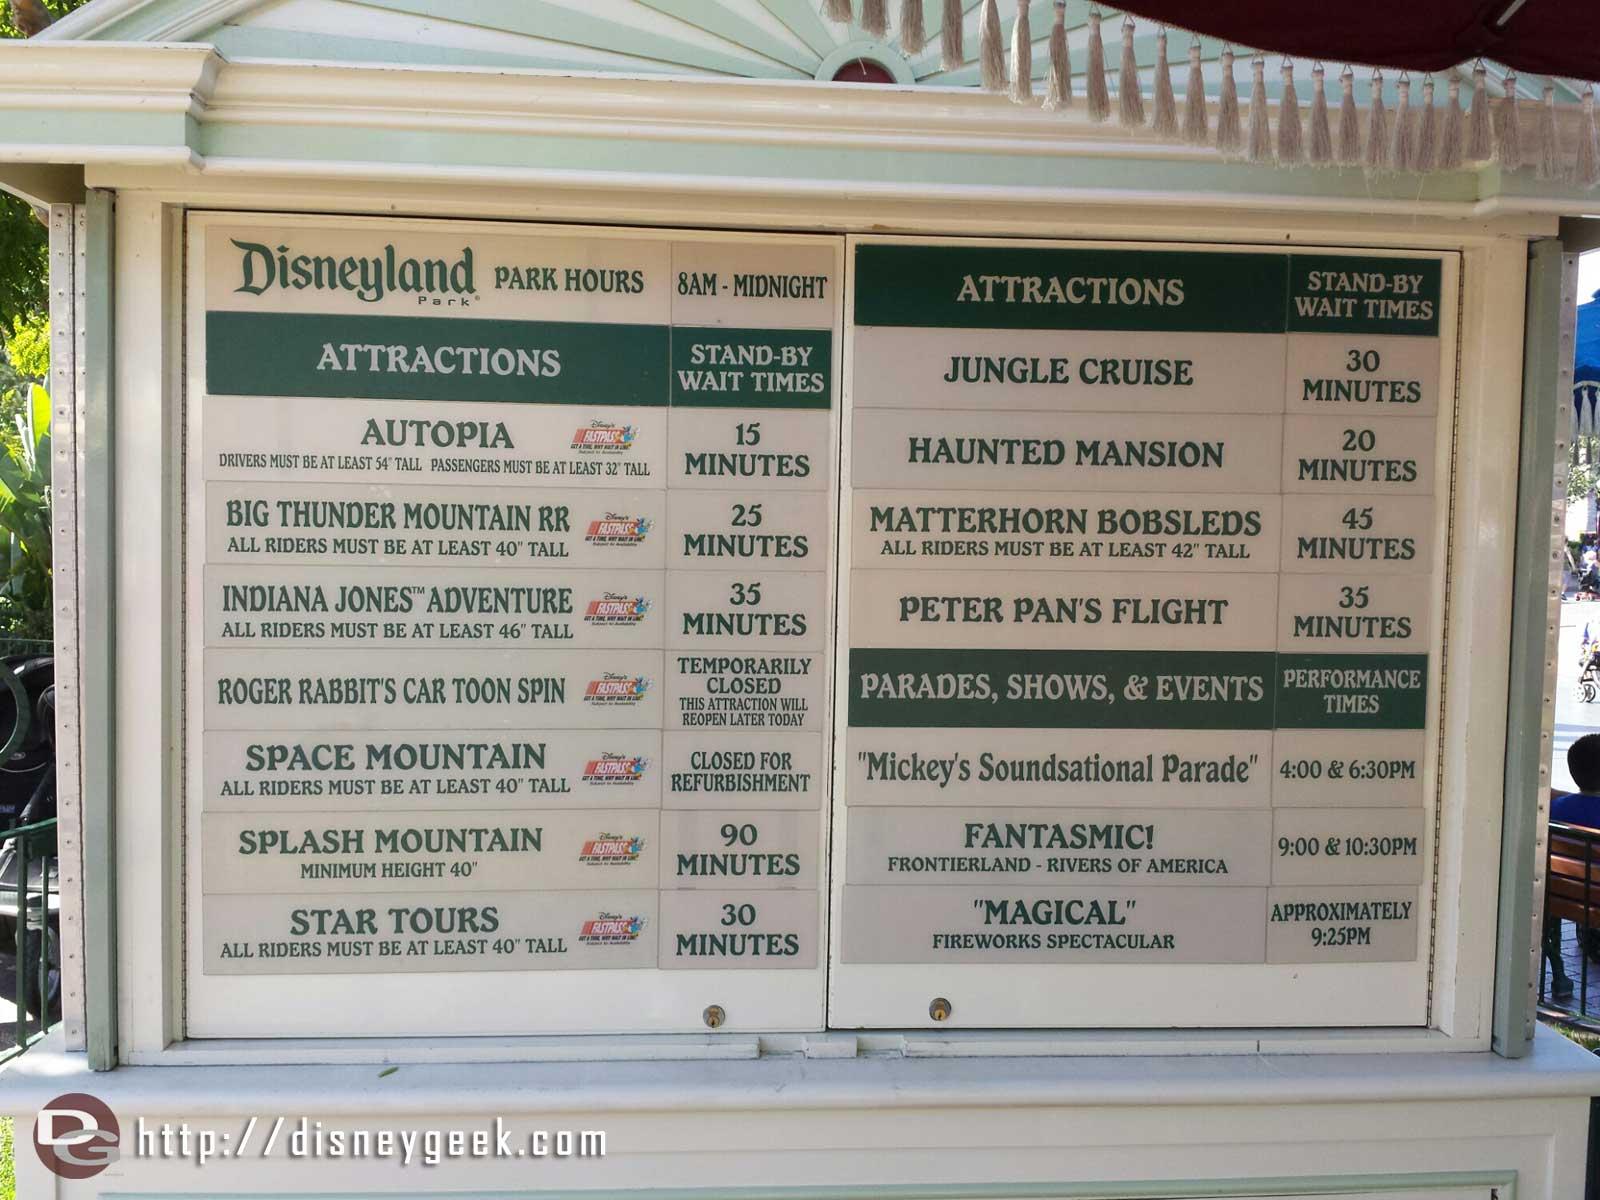 #Disneyland wait times at 5:00pm